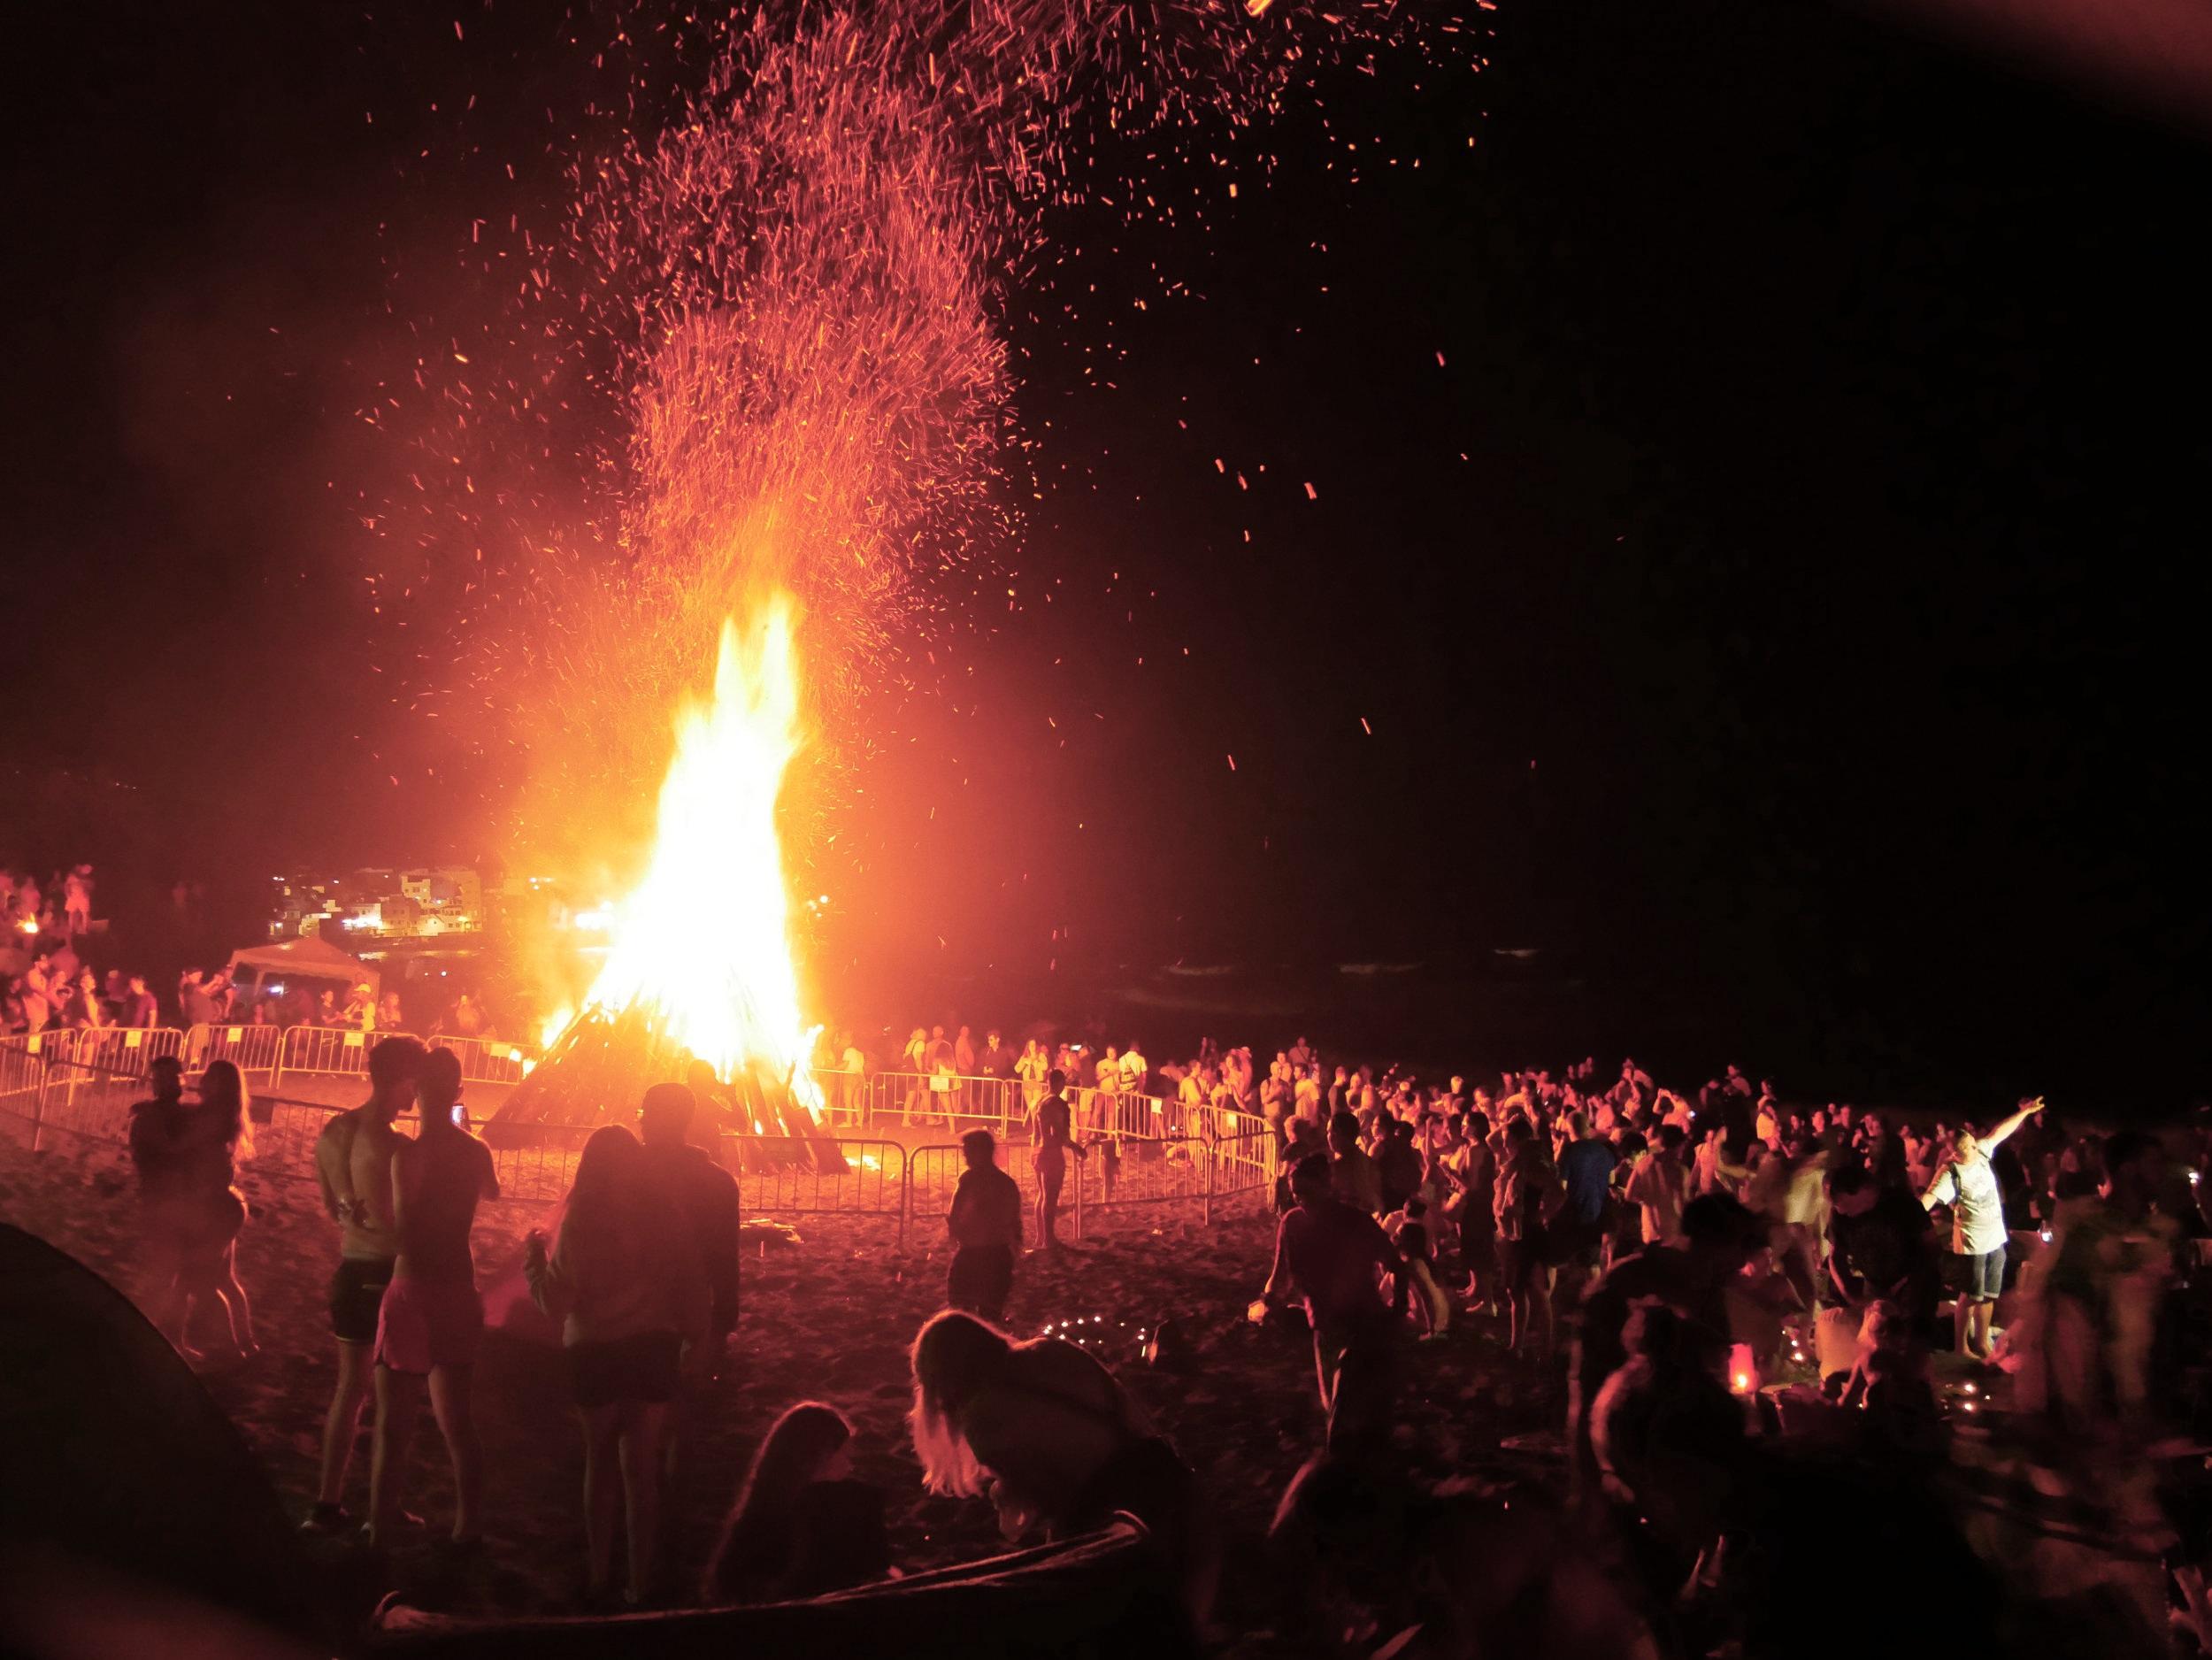 Big bonfires and thousands of people on Playa de Jardin